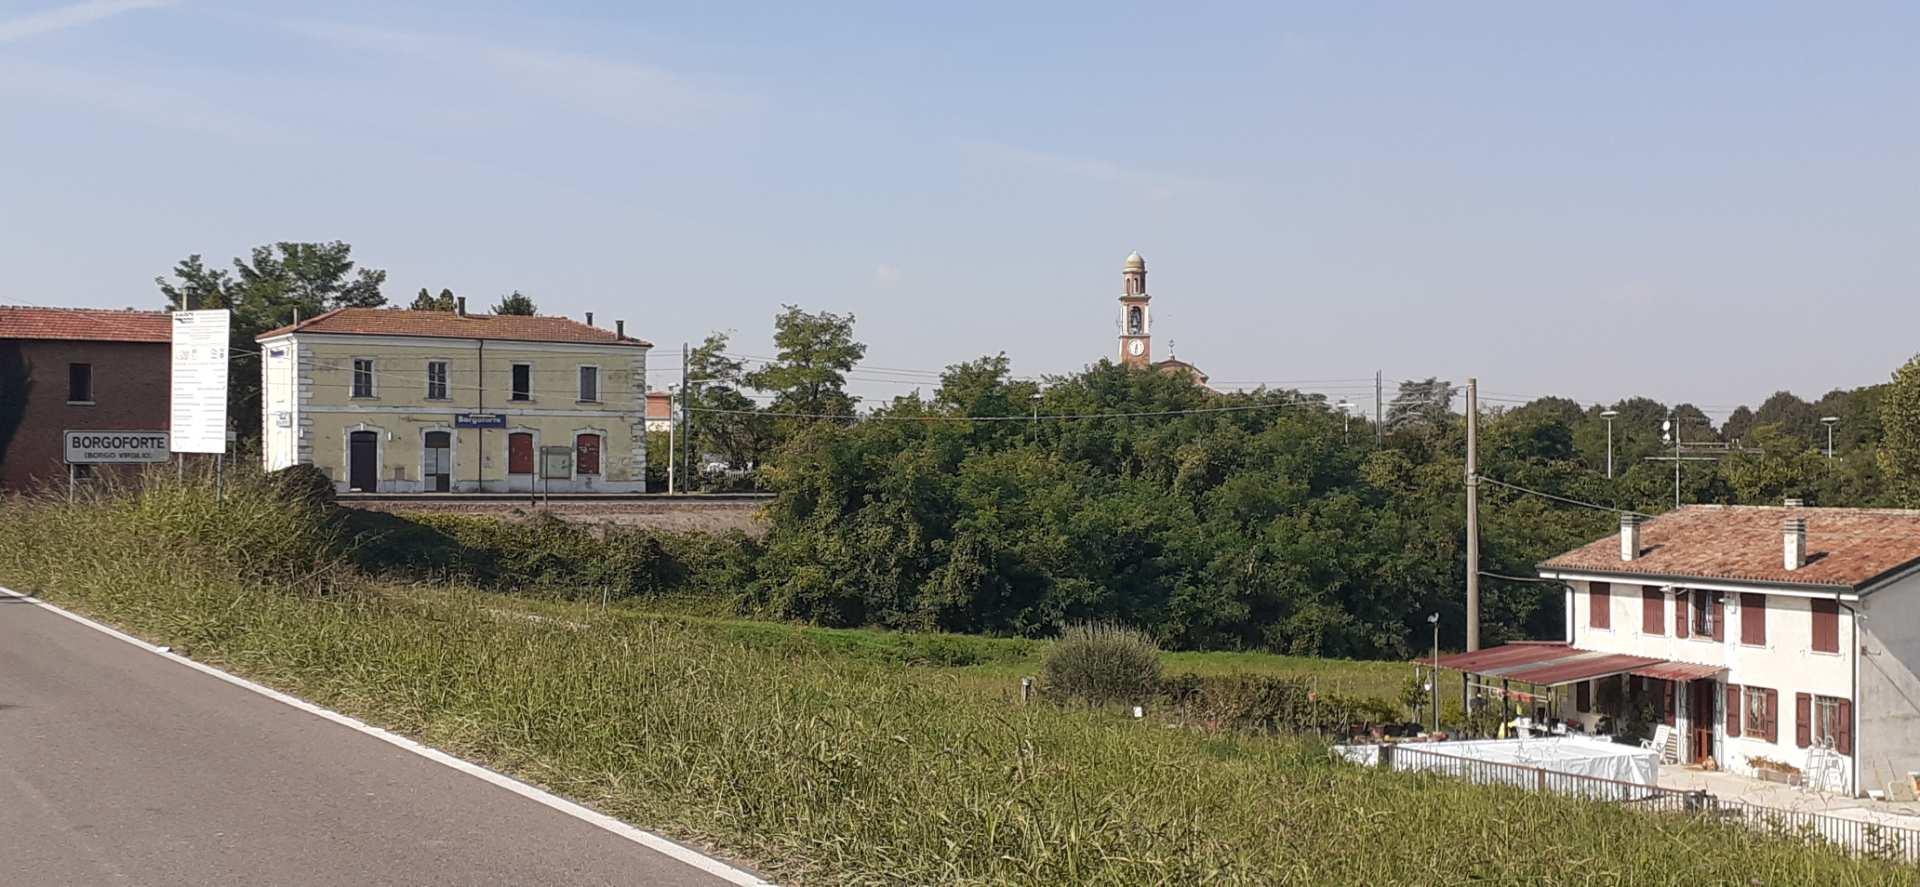 Borgoforte